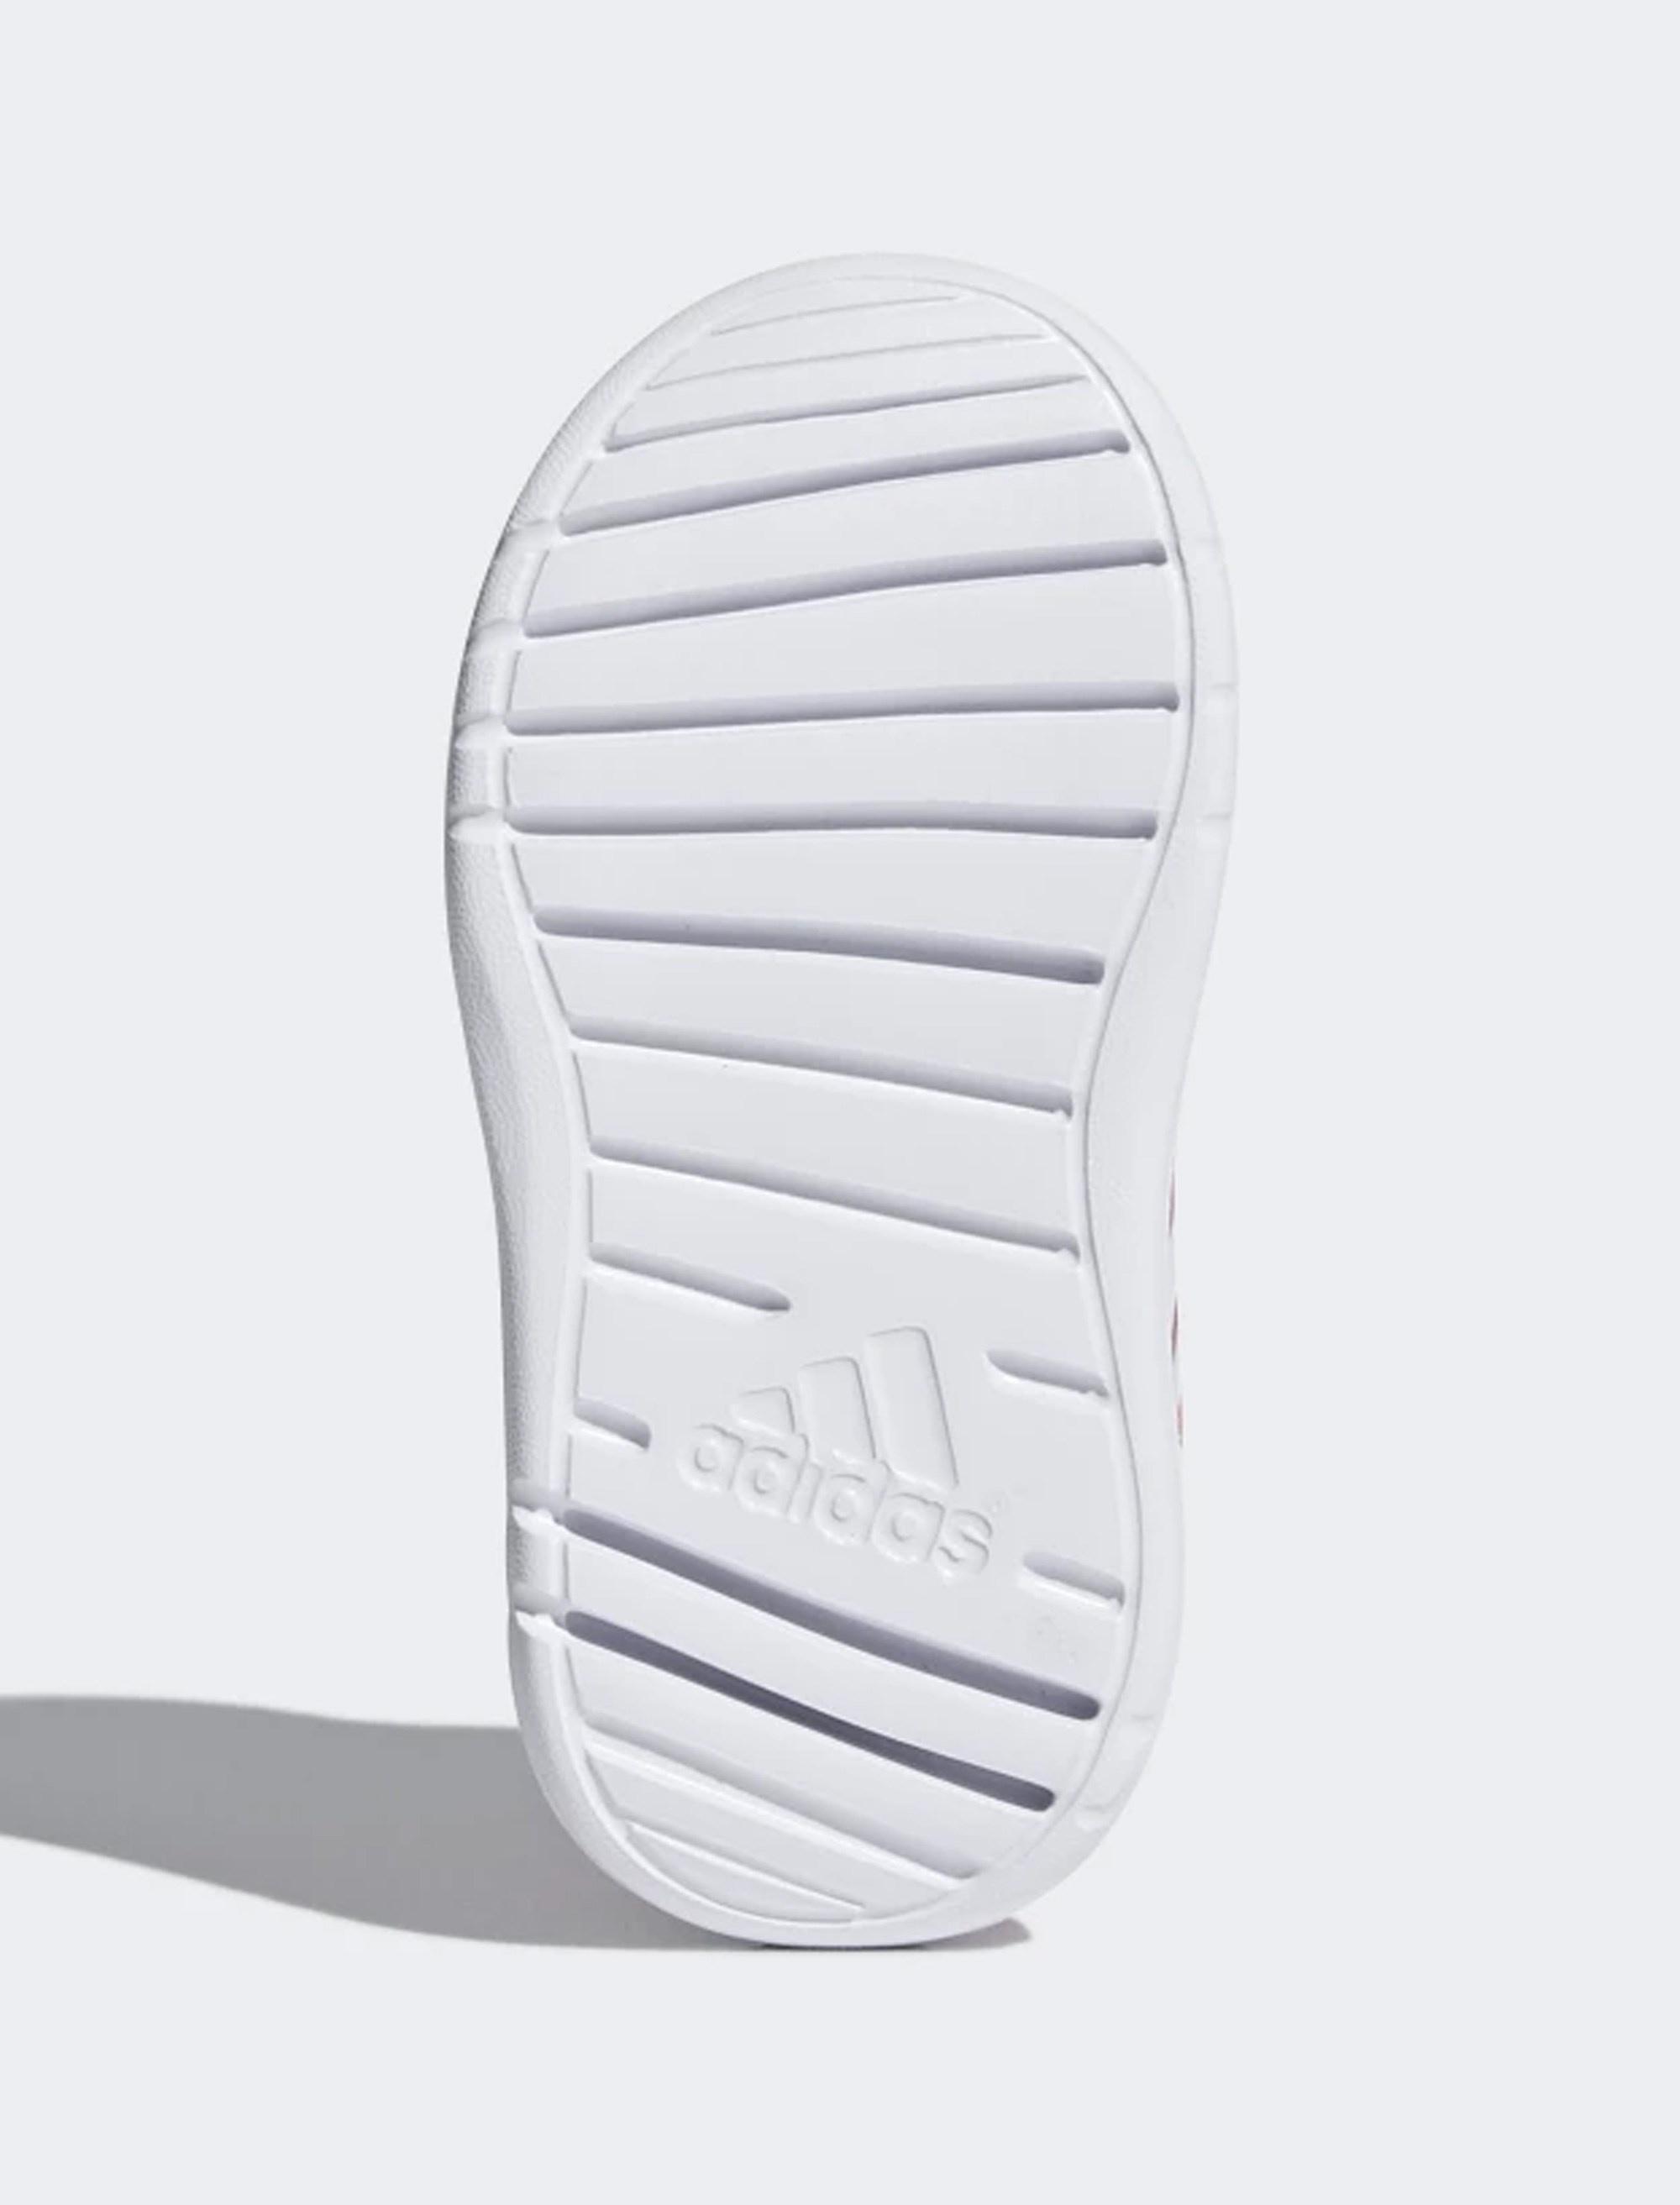 کفش دویدن چسبی نوزادی Altarun - آدیداس - صورتی - 3